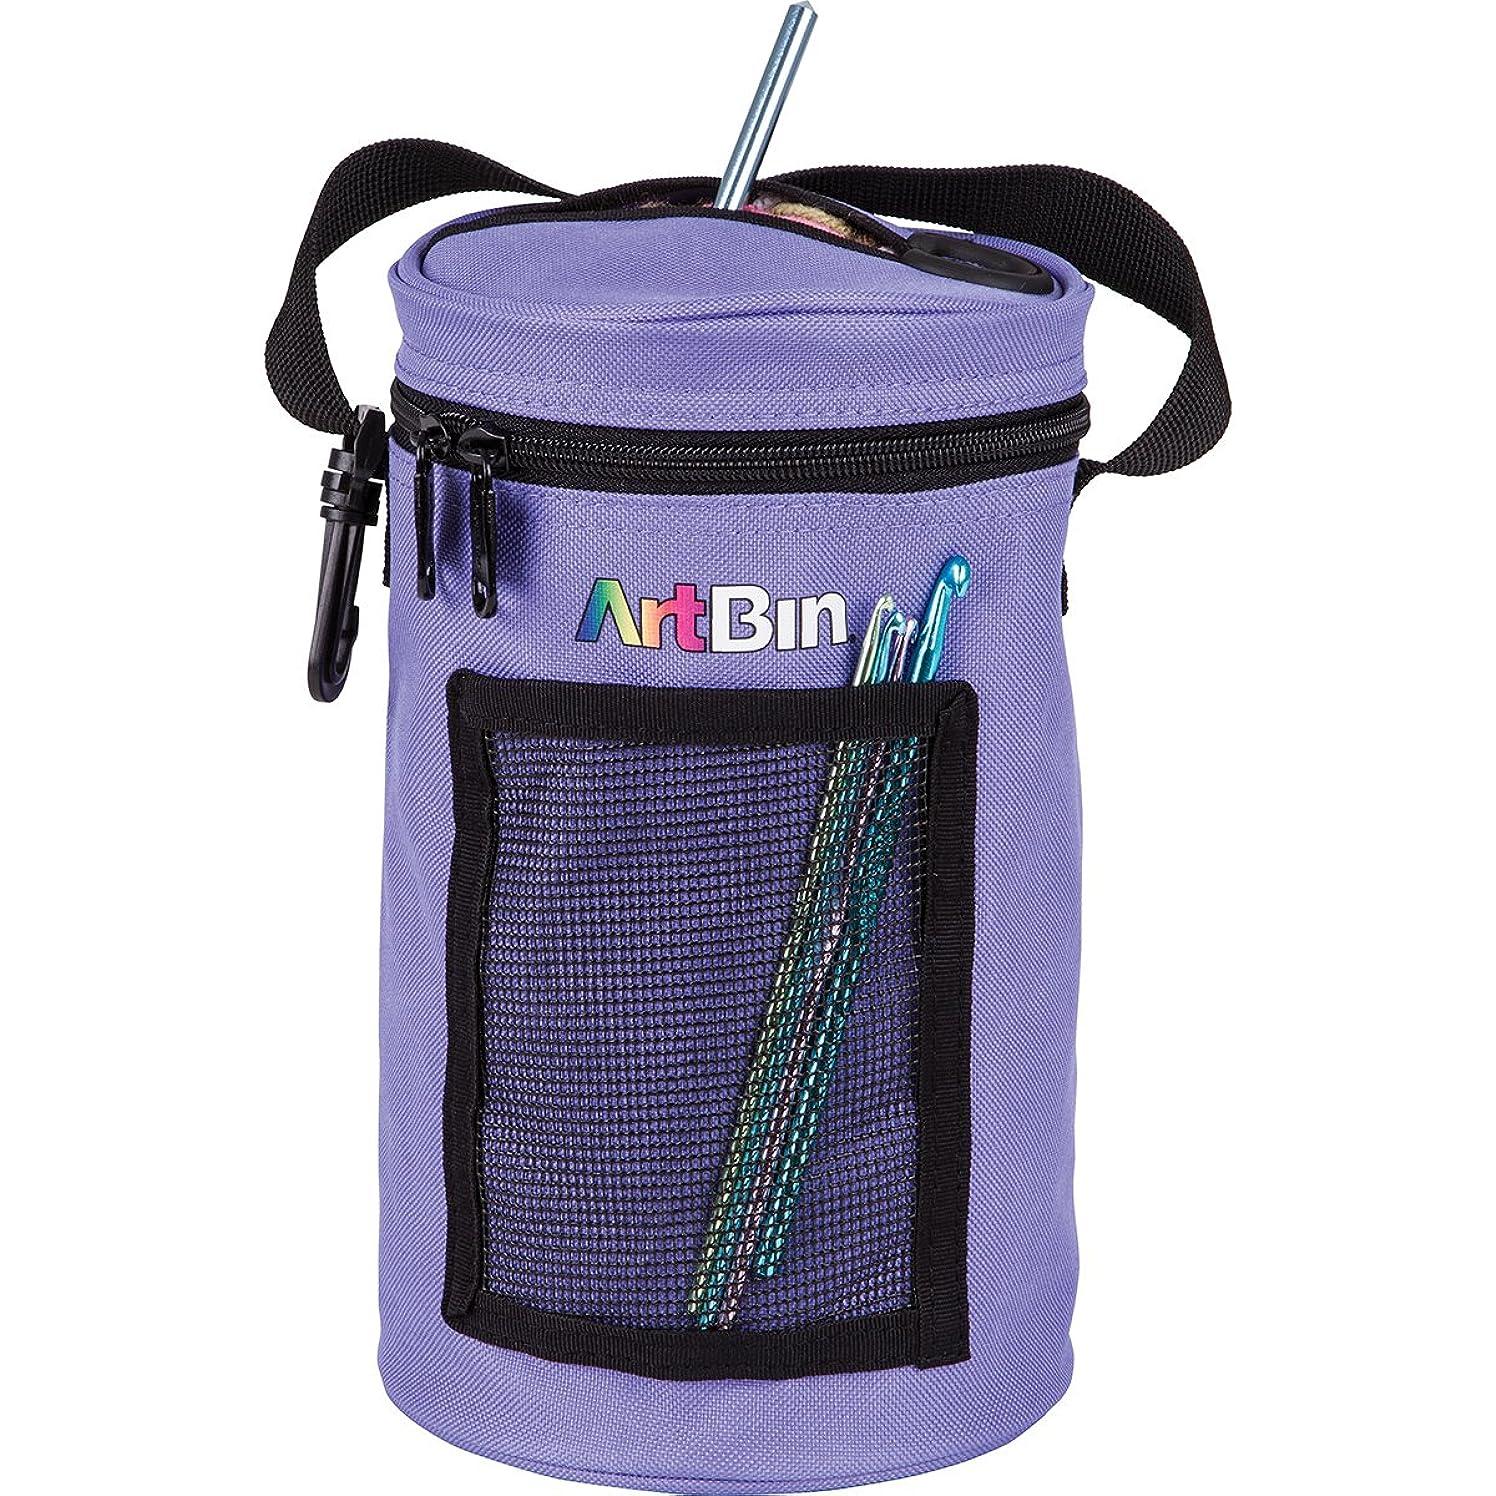 ArtBin Mini Yarn Drum Knitting and Crochet Tote Bag, Periwinkle 6832AG,